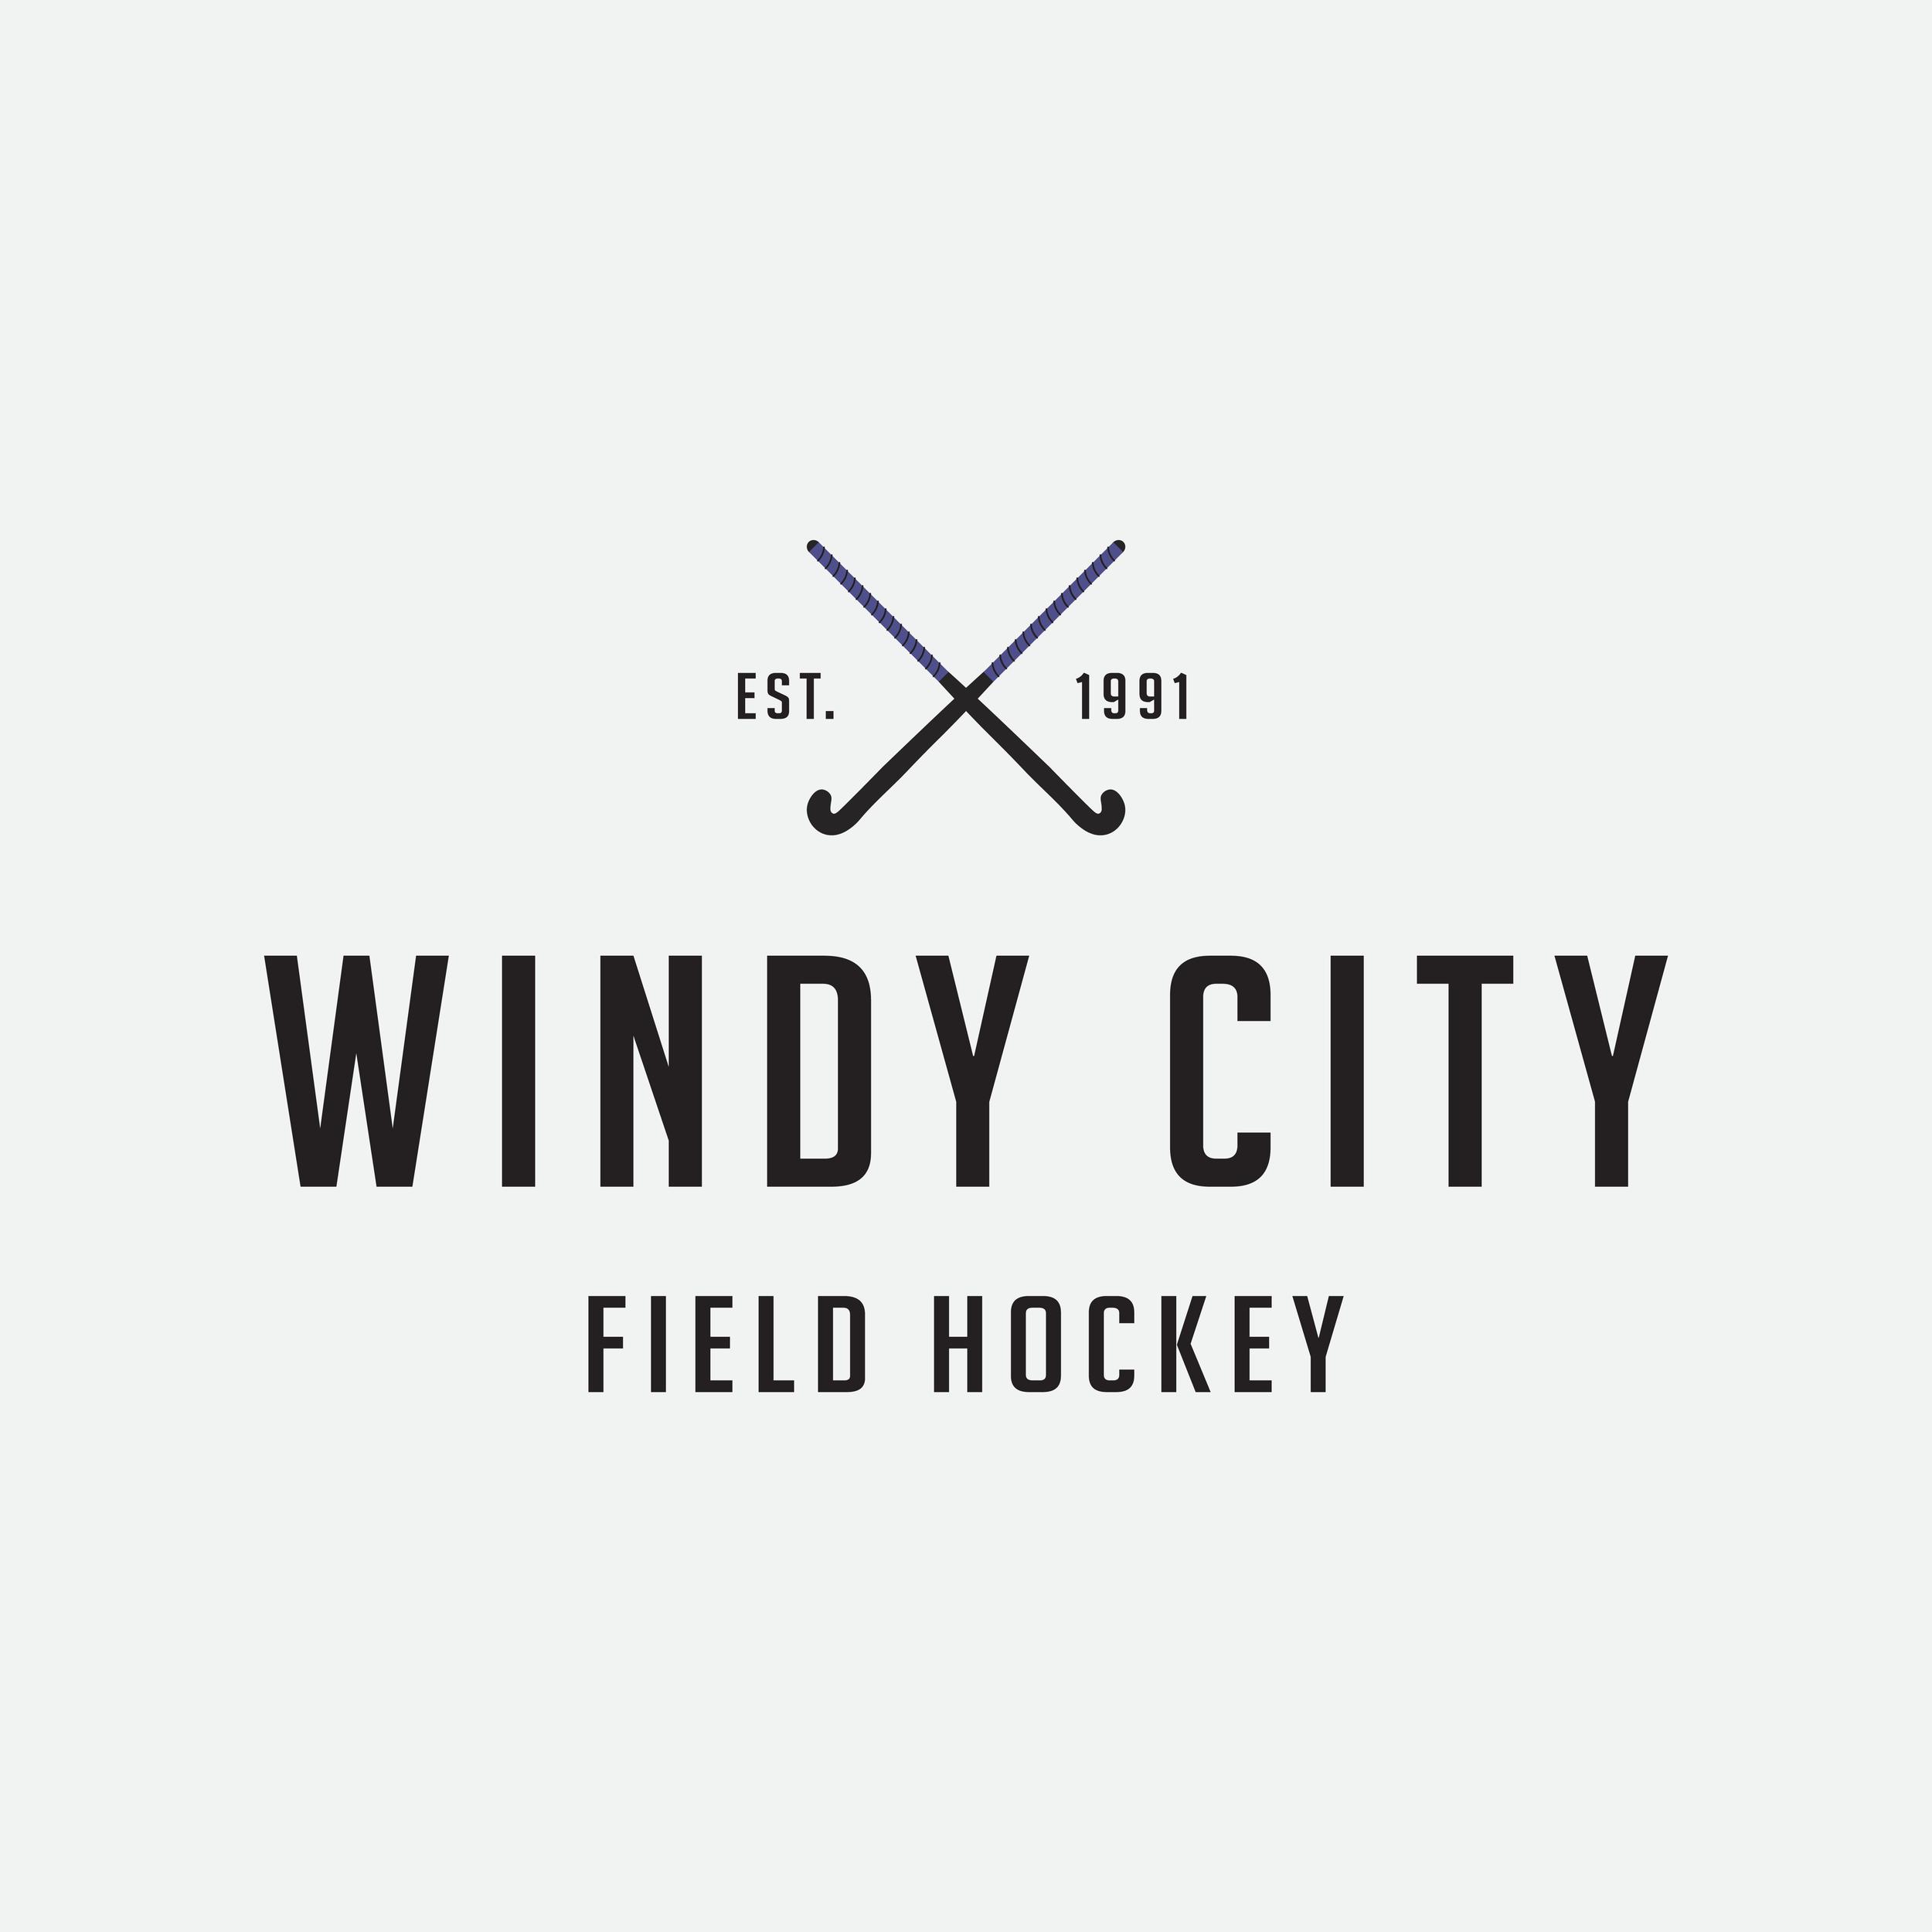 Windy City Field Hockey3.png